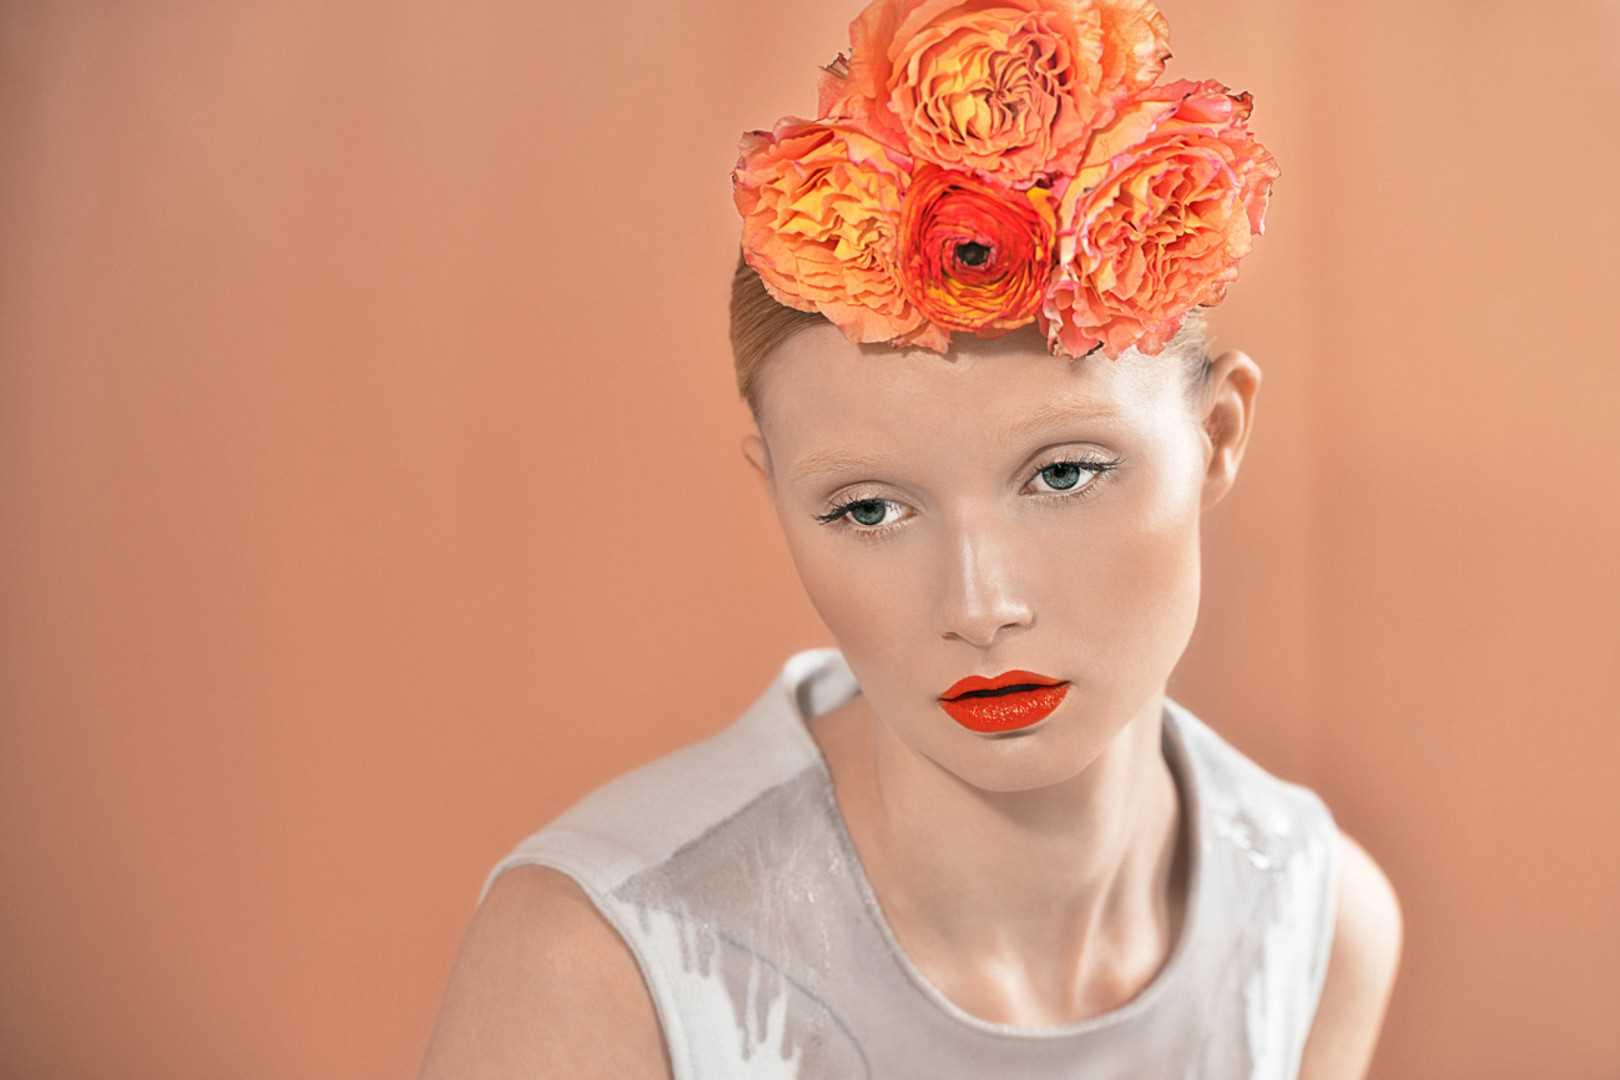 Fashion Photography by Sarah Dulay